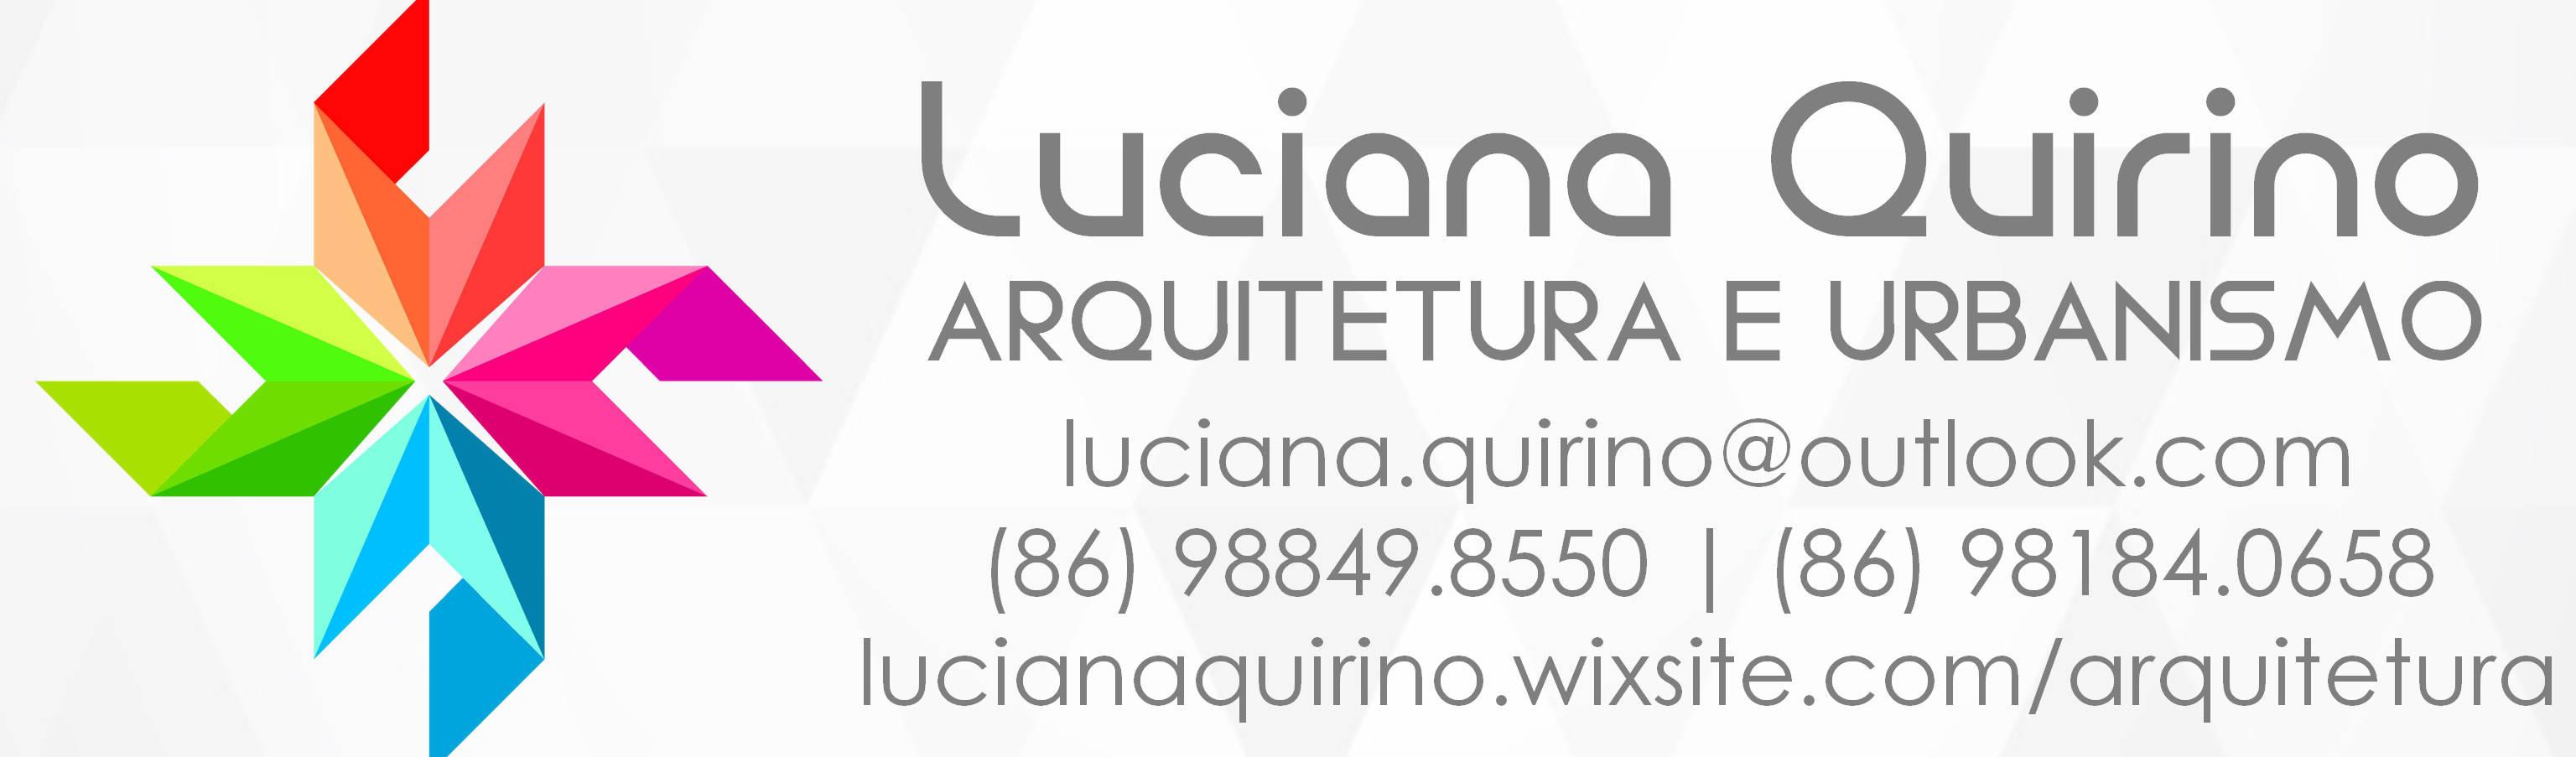 Luciana Quirino Arquitetura e Urbanismo